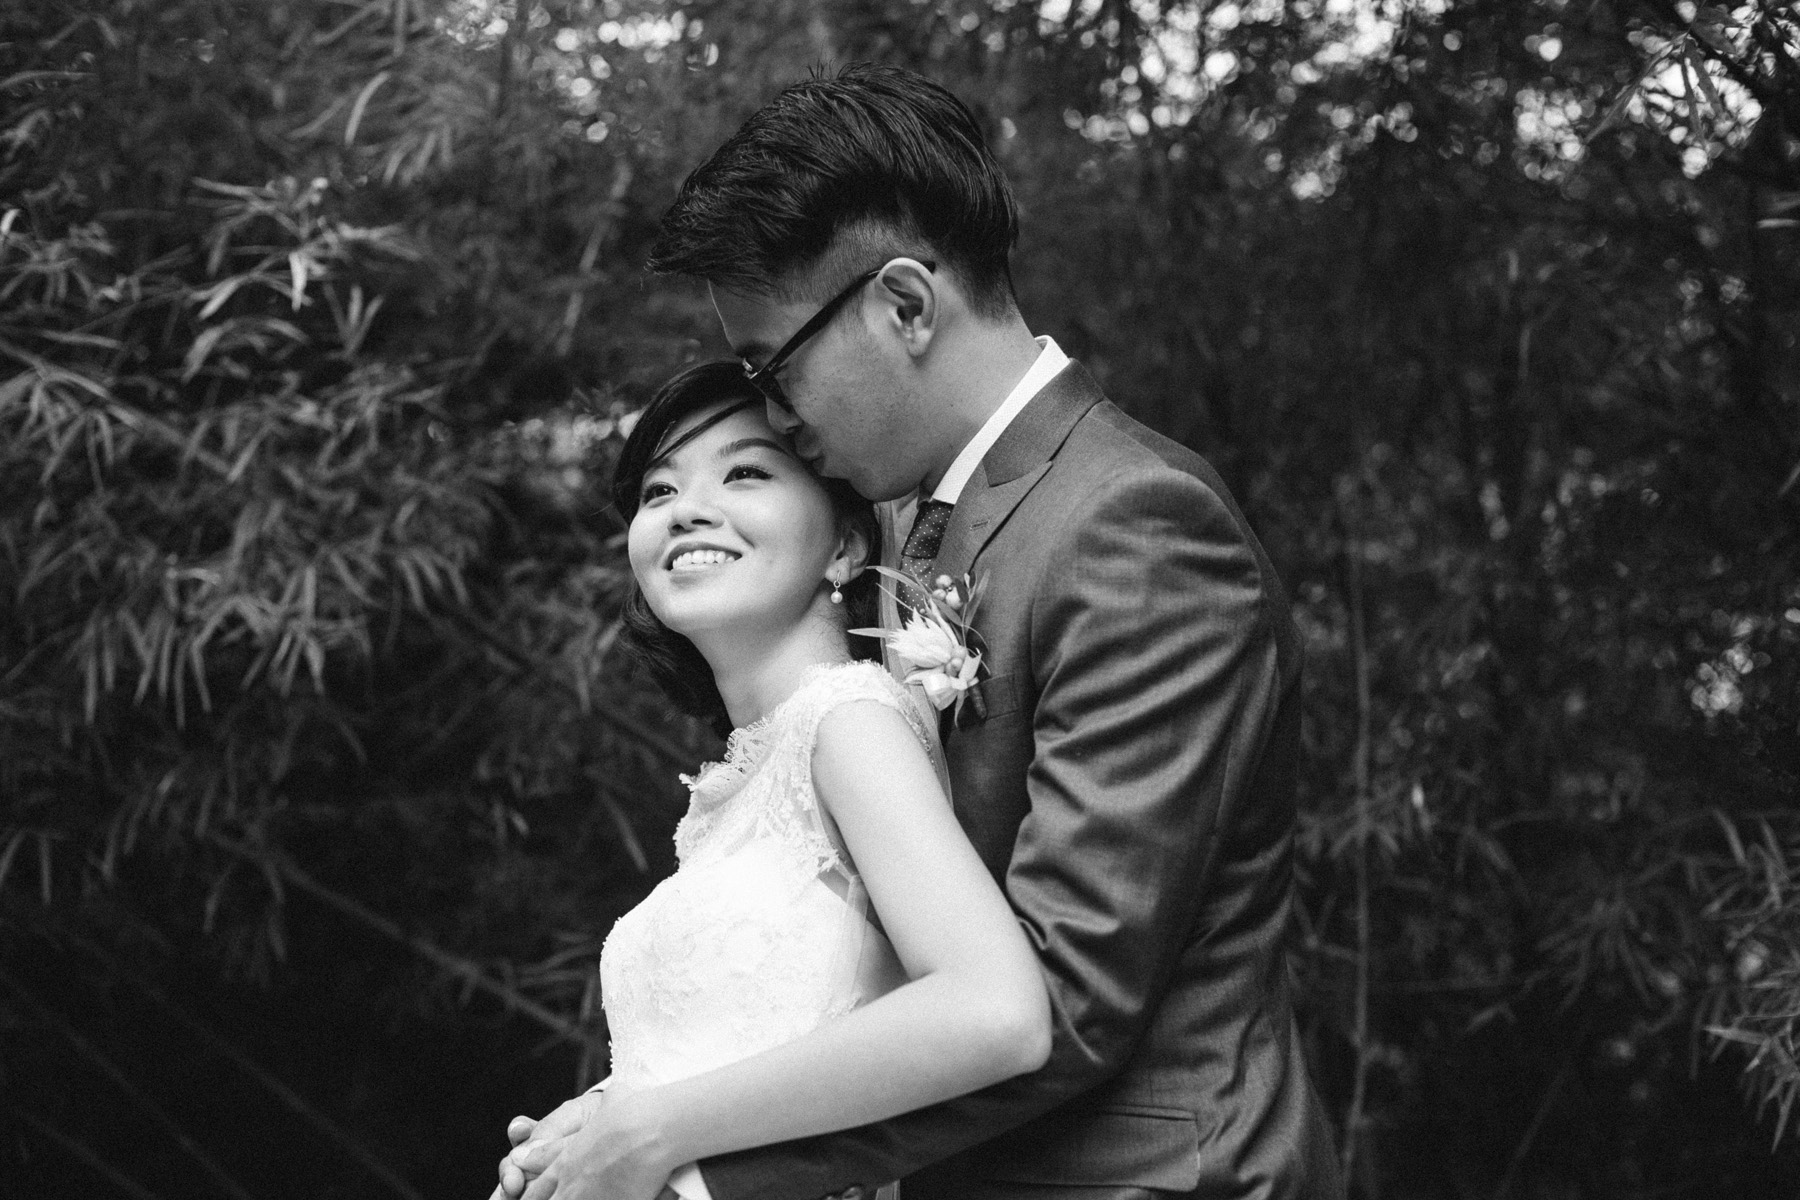 singapore-wedding-travel-photographer-faith-alvin-wedding-wmt-33.jpg